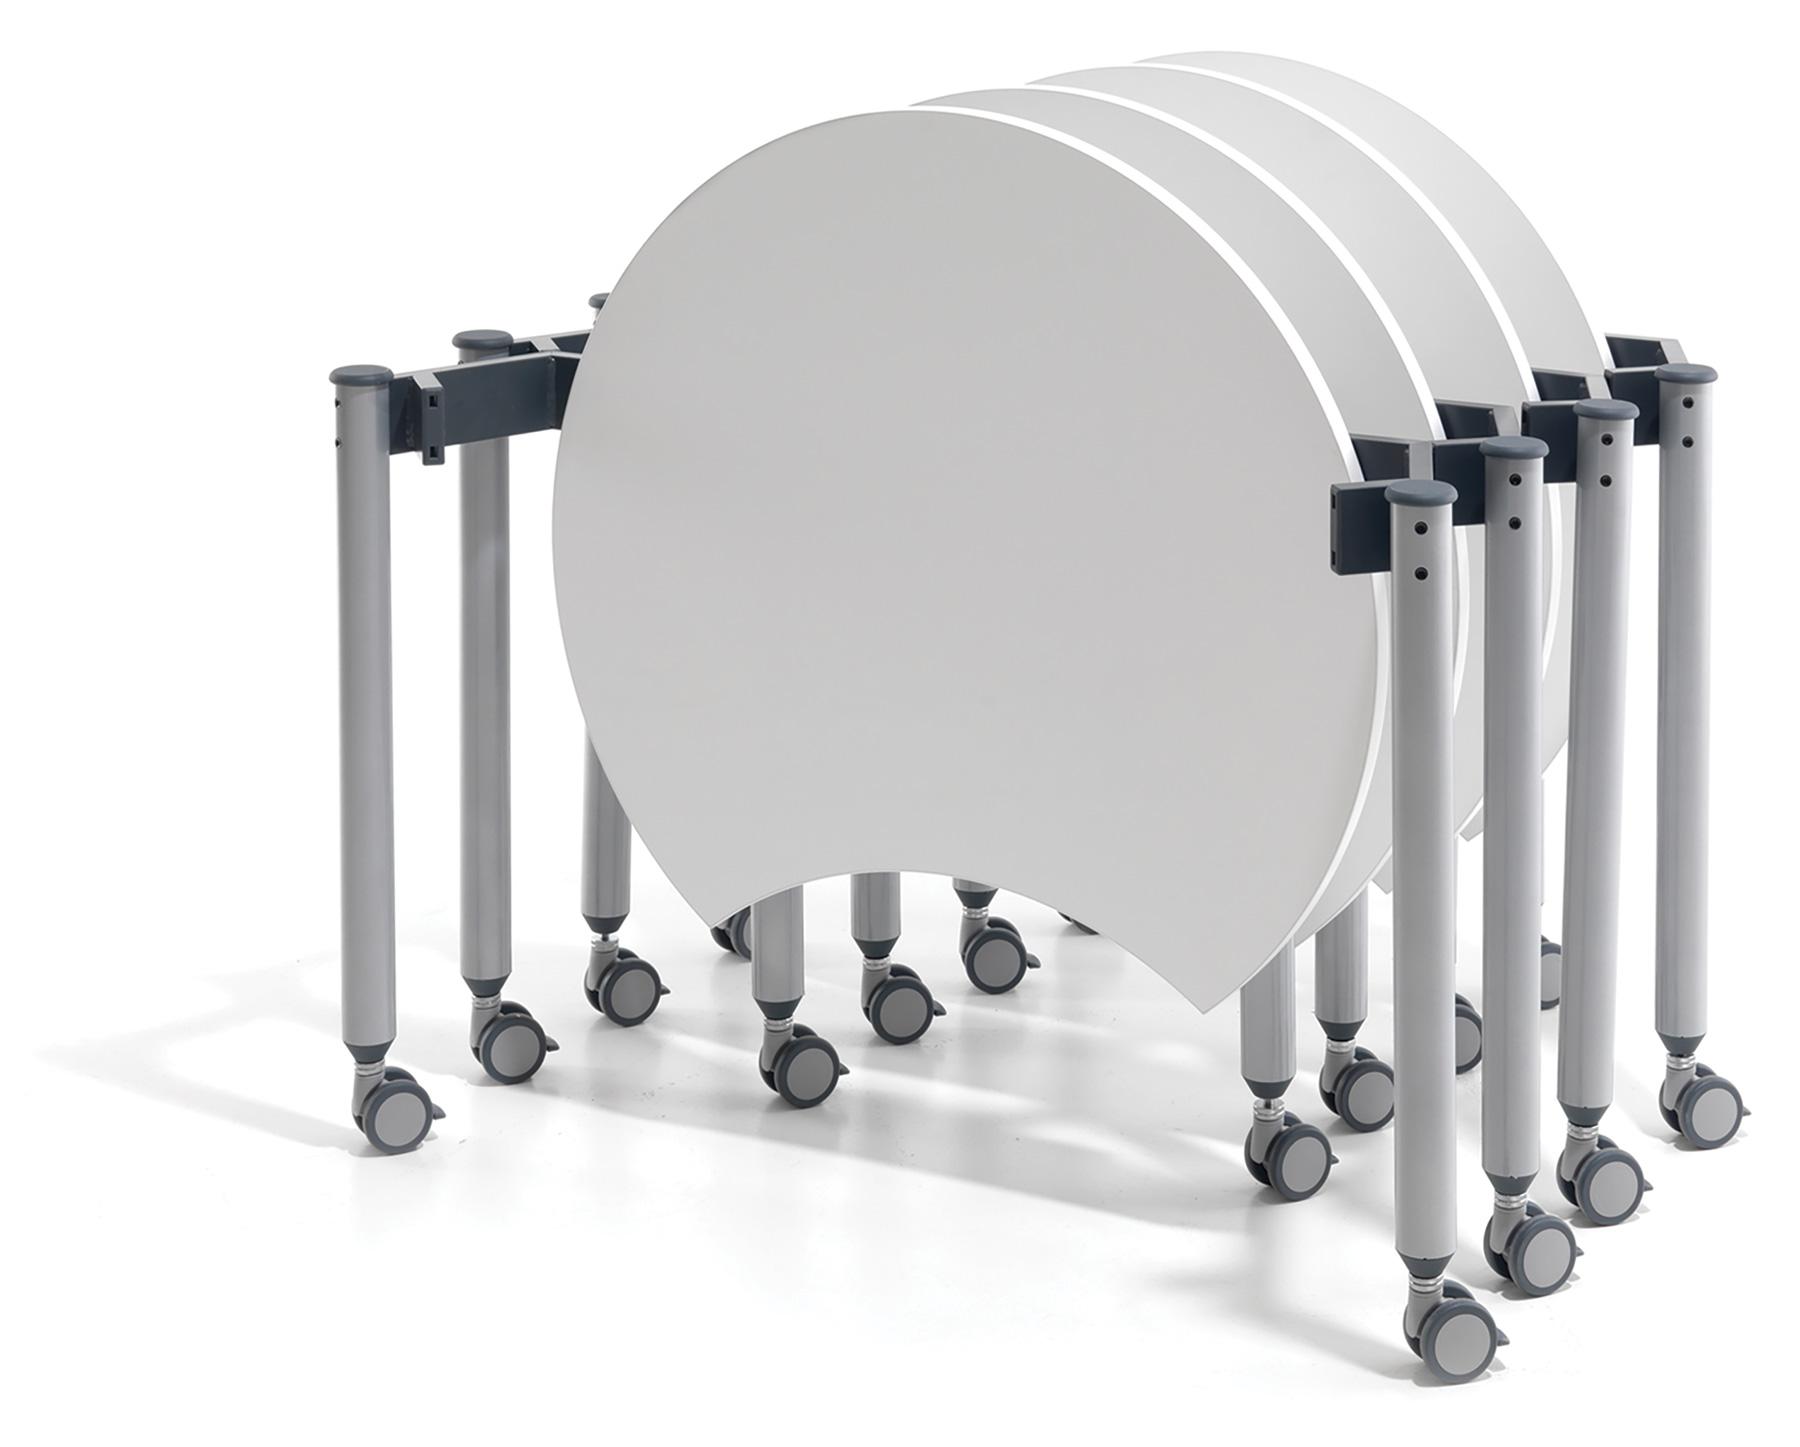 Muzo Kite Mini Mobile Flip Tables for Adaptable Library Spaces